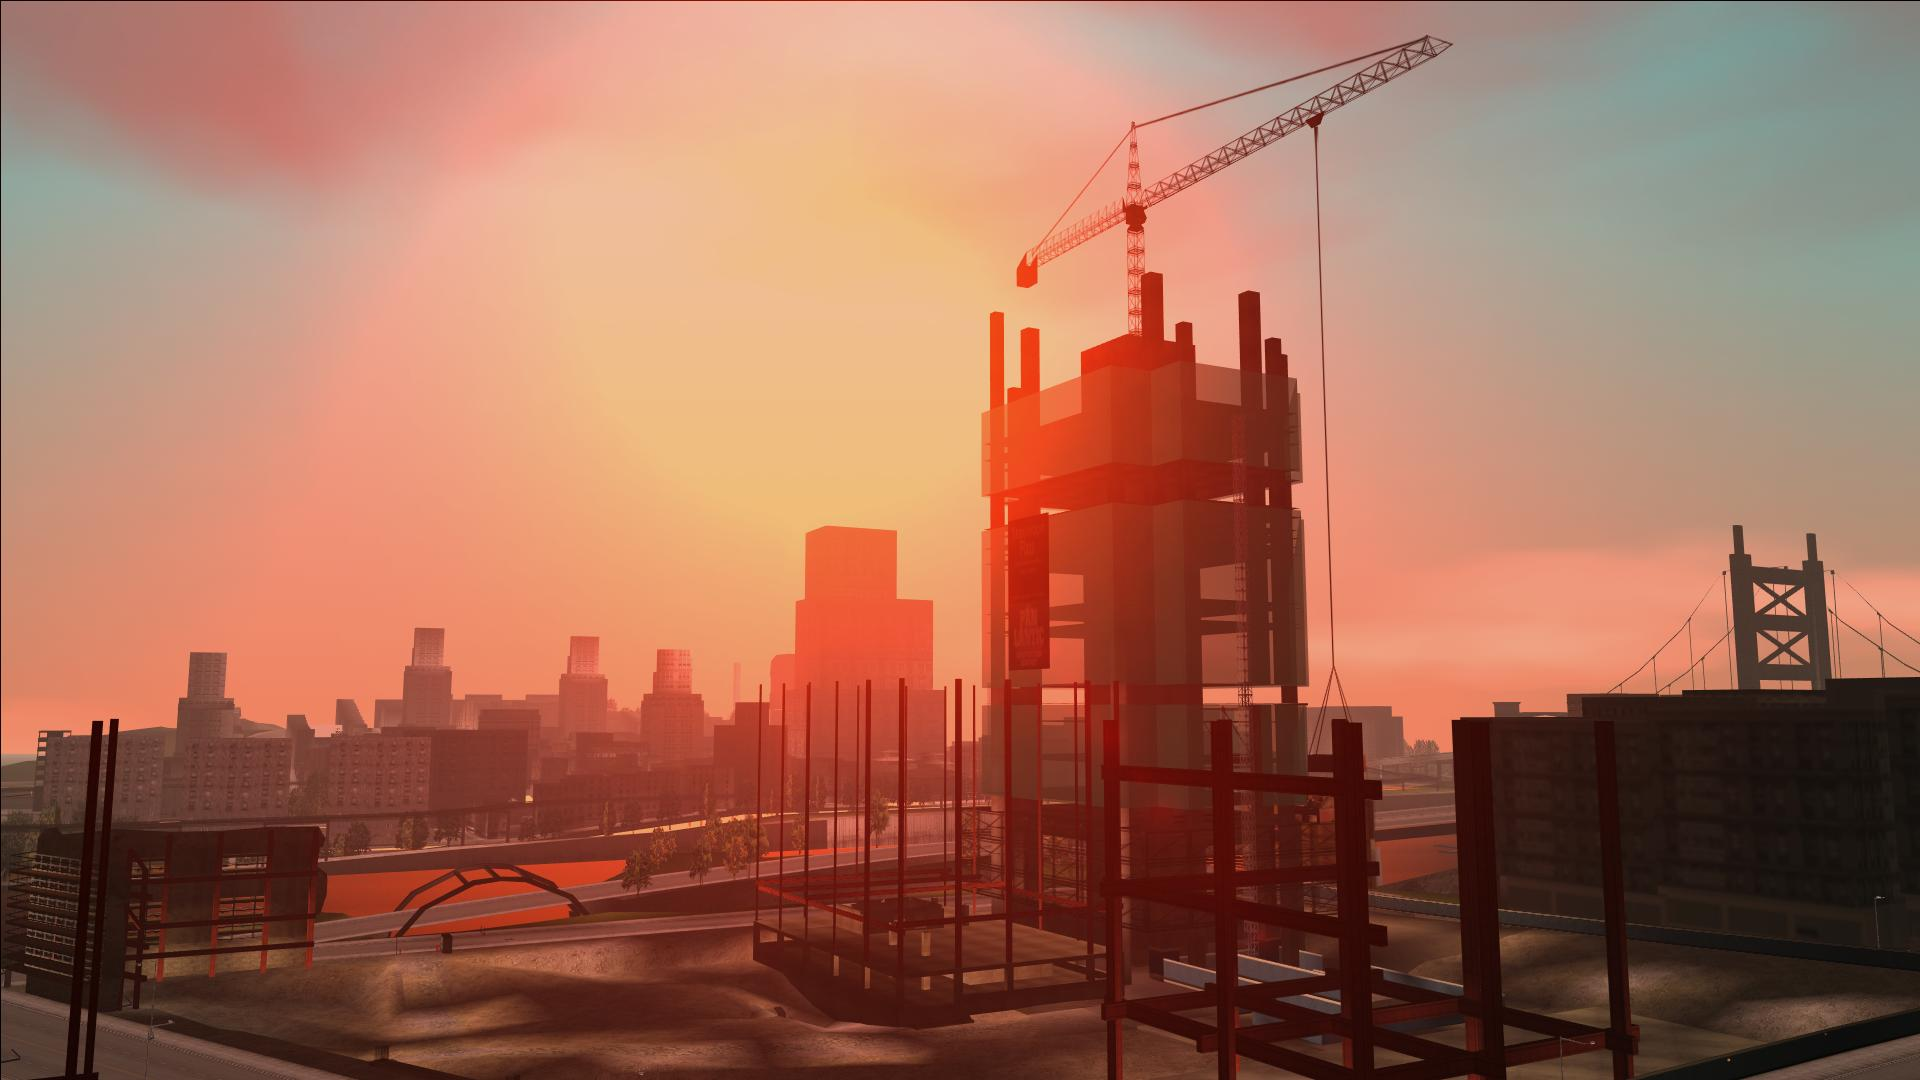 The new sun size code as seen on GTA: III weather